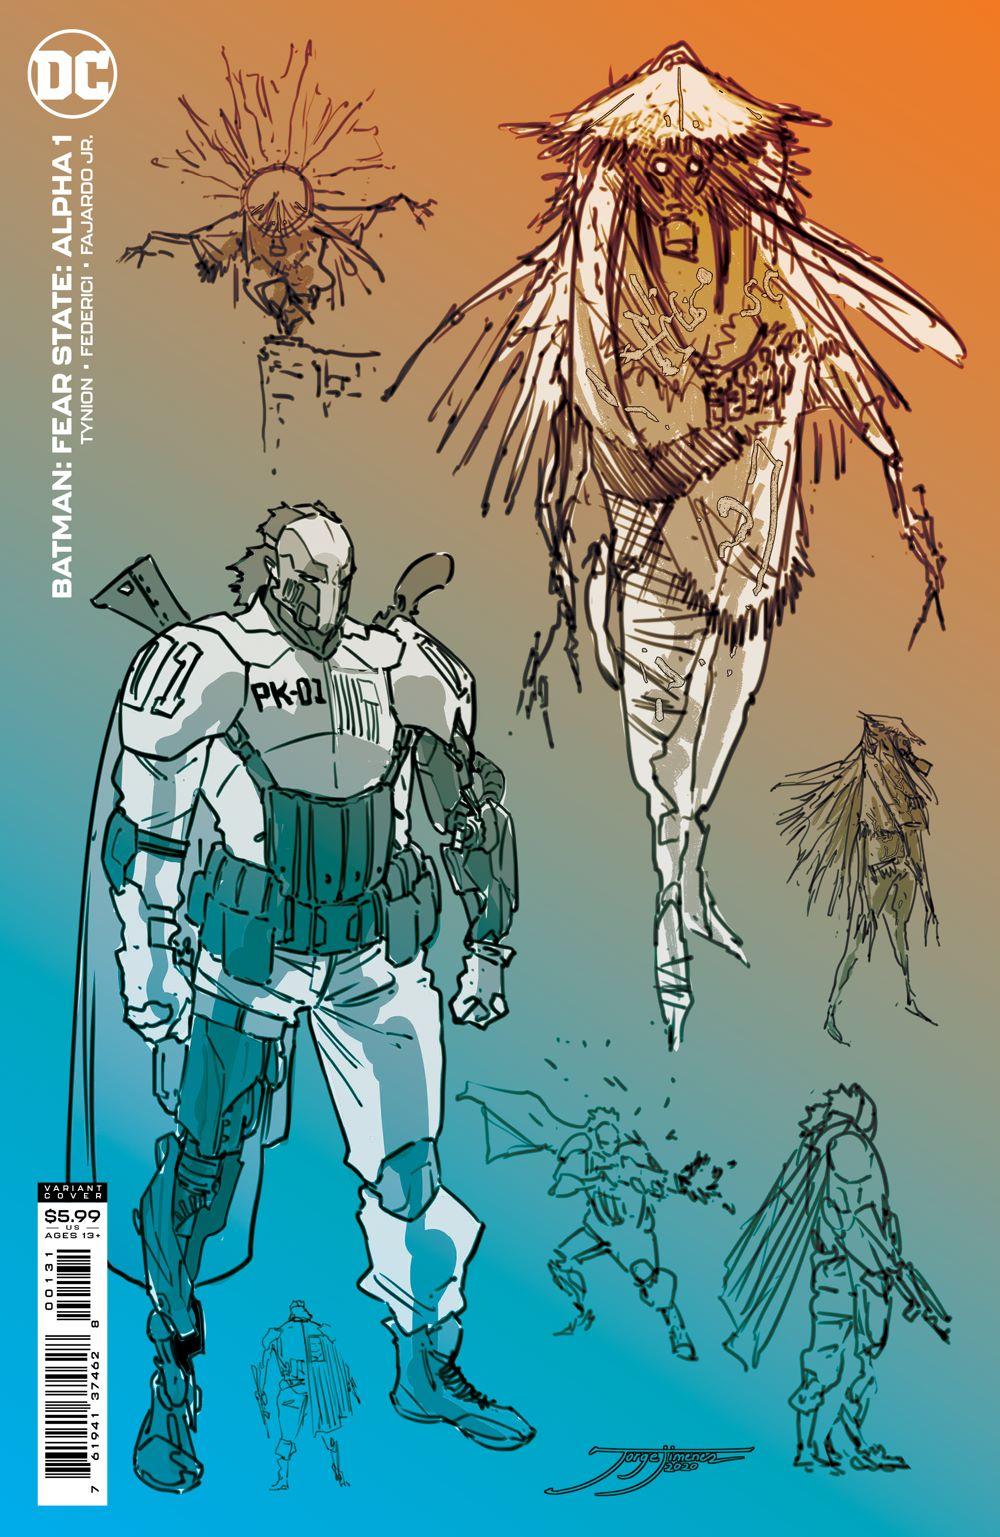 BM_FS_ALPHA_Cv1_1in25_var_00131 DC Comics August 2021 Solicitations